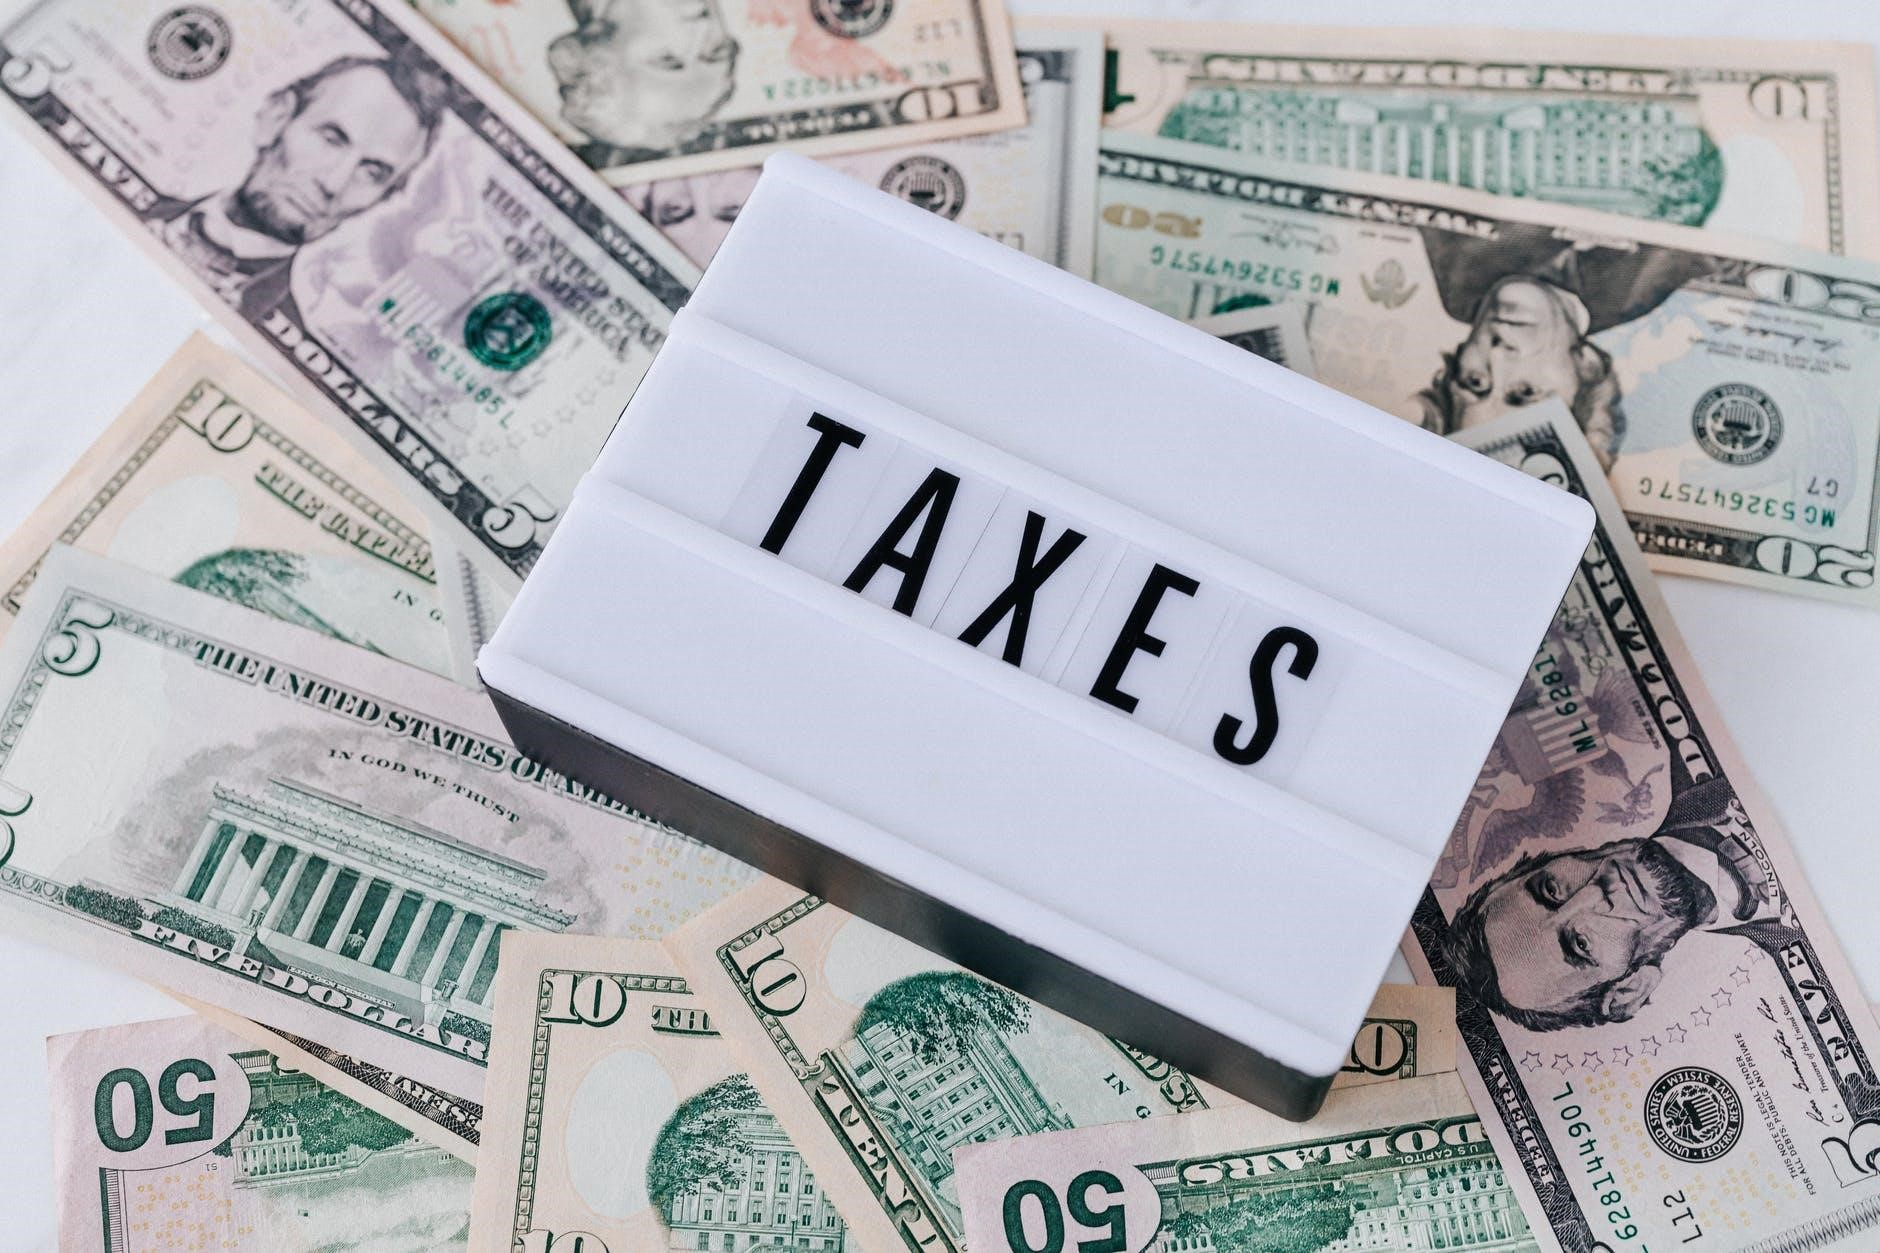 laporan pajak perusahaan